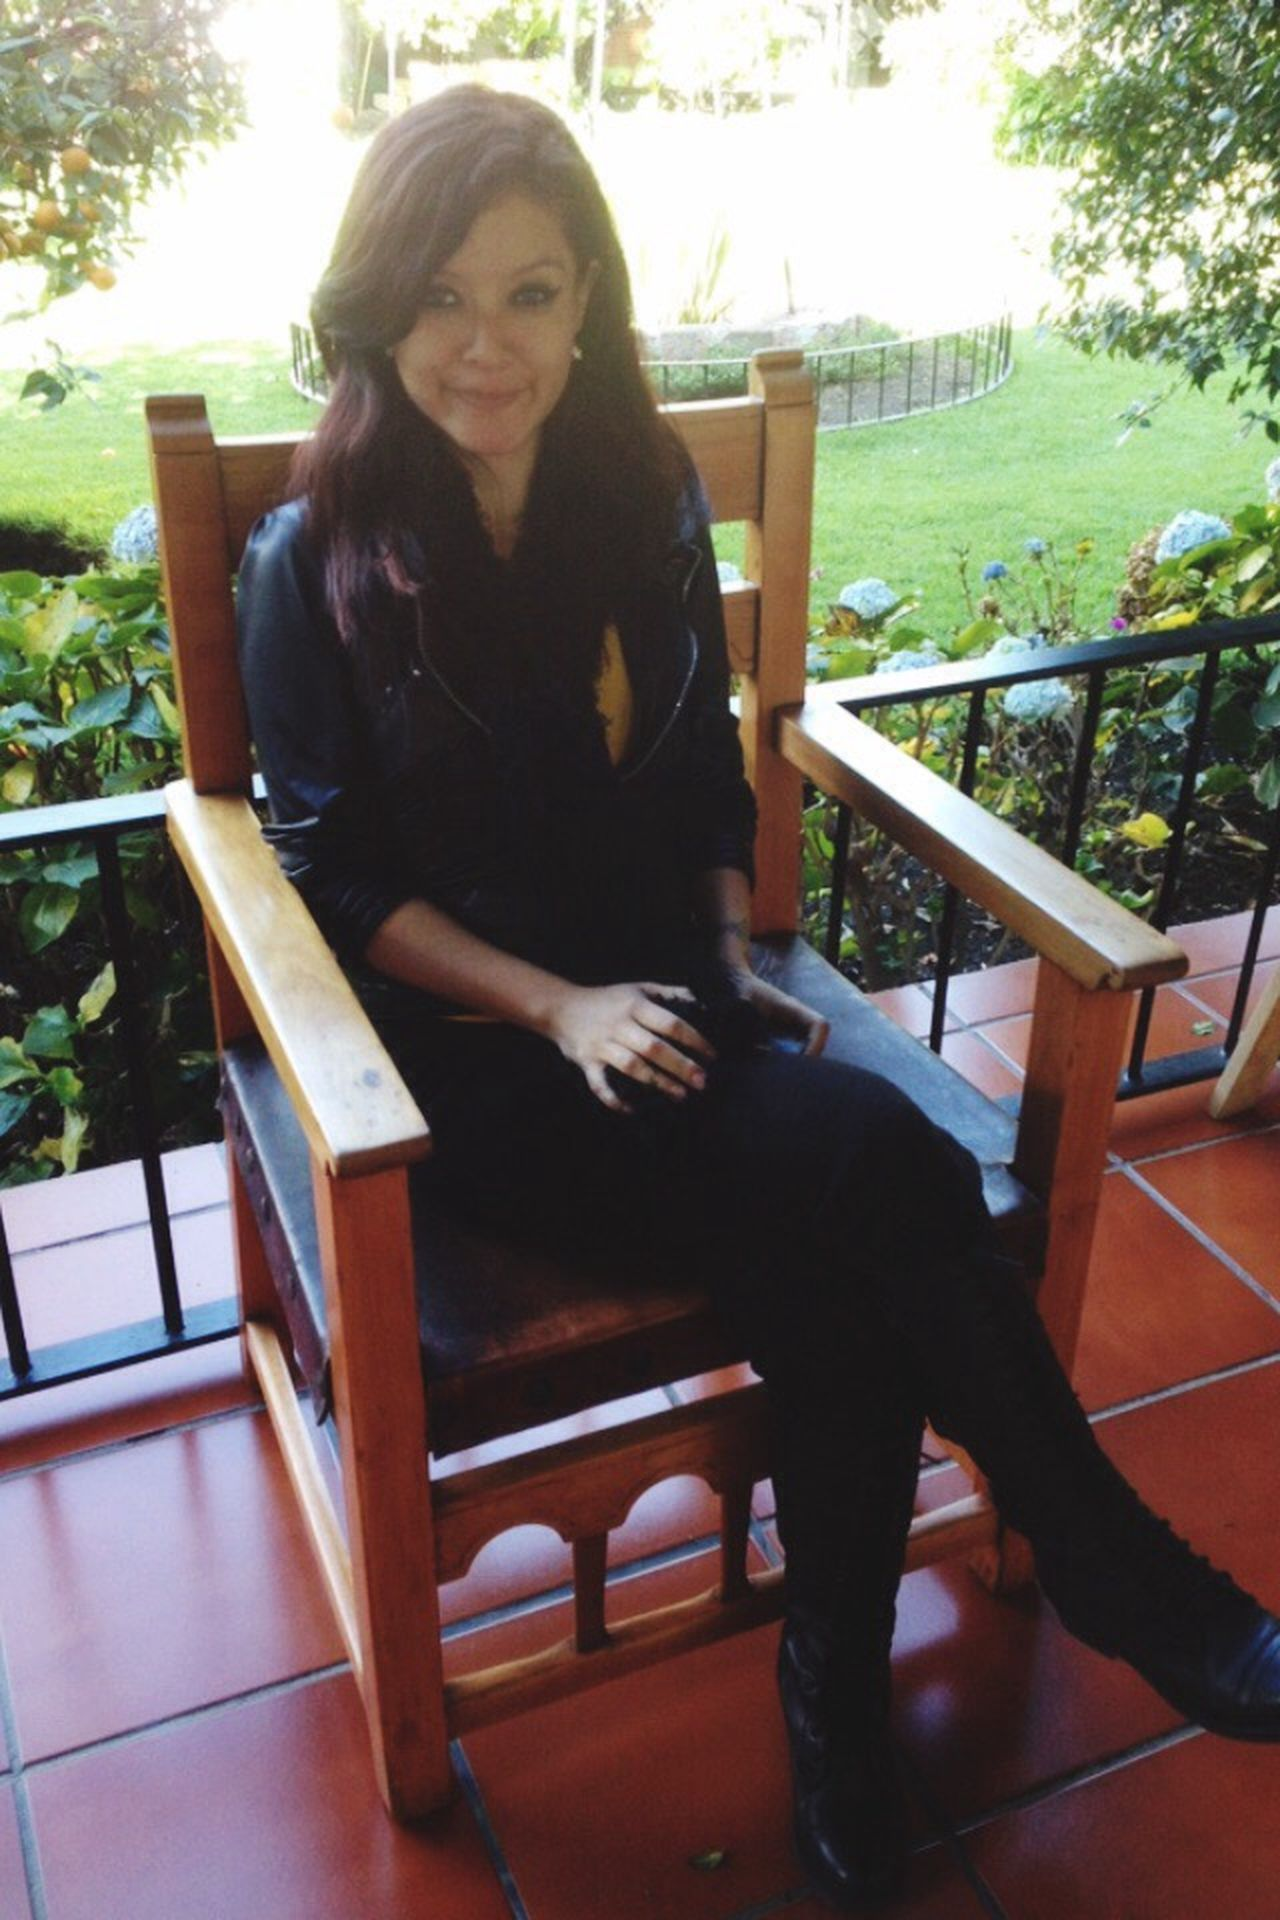 Peka Cure Beautiful MexicanGirl Museum Dolores Olmedo Enjoying Life Passionate Artist Colored Precious Moments Of Life Iloveblackcolour Helloworld ImHappyToBeMySelf HappyLikeaChild Happylife💠